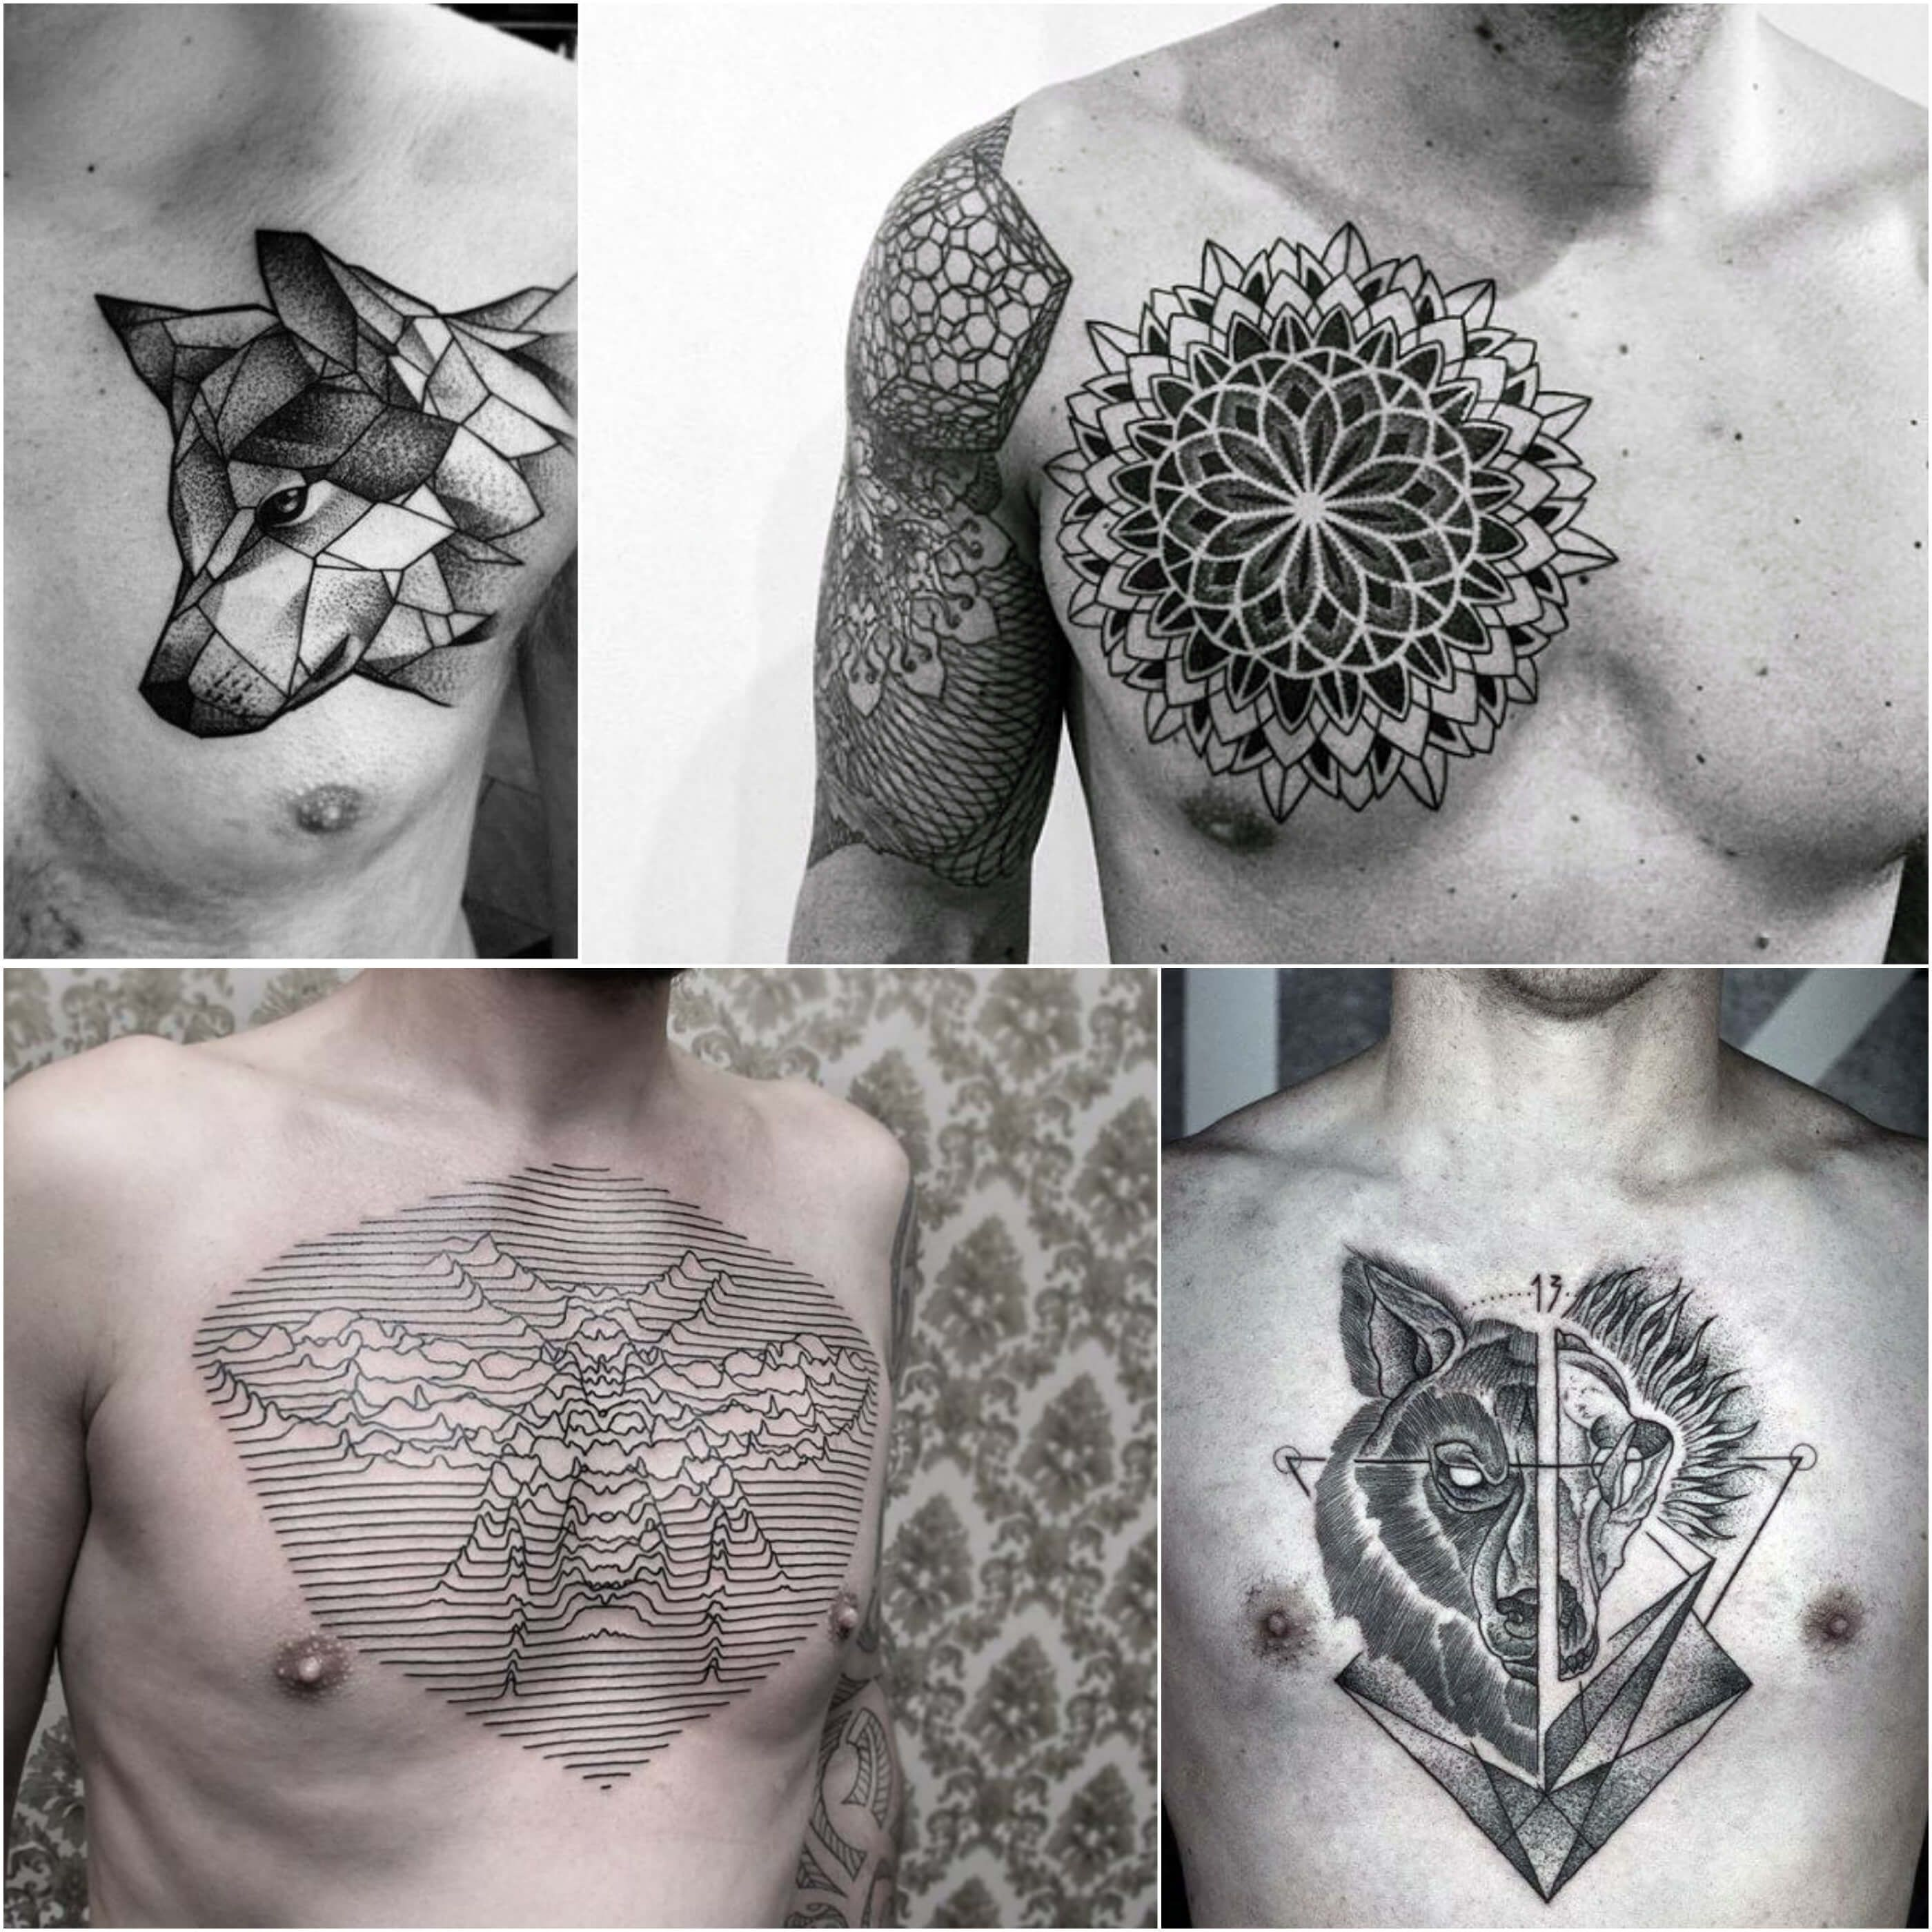 100 Best Chest Tattoos For Men Chest Tattoo Gallery For Men Chest Tattoo Men Tattoos For Guys Cool Chest Tattoos